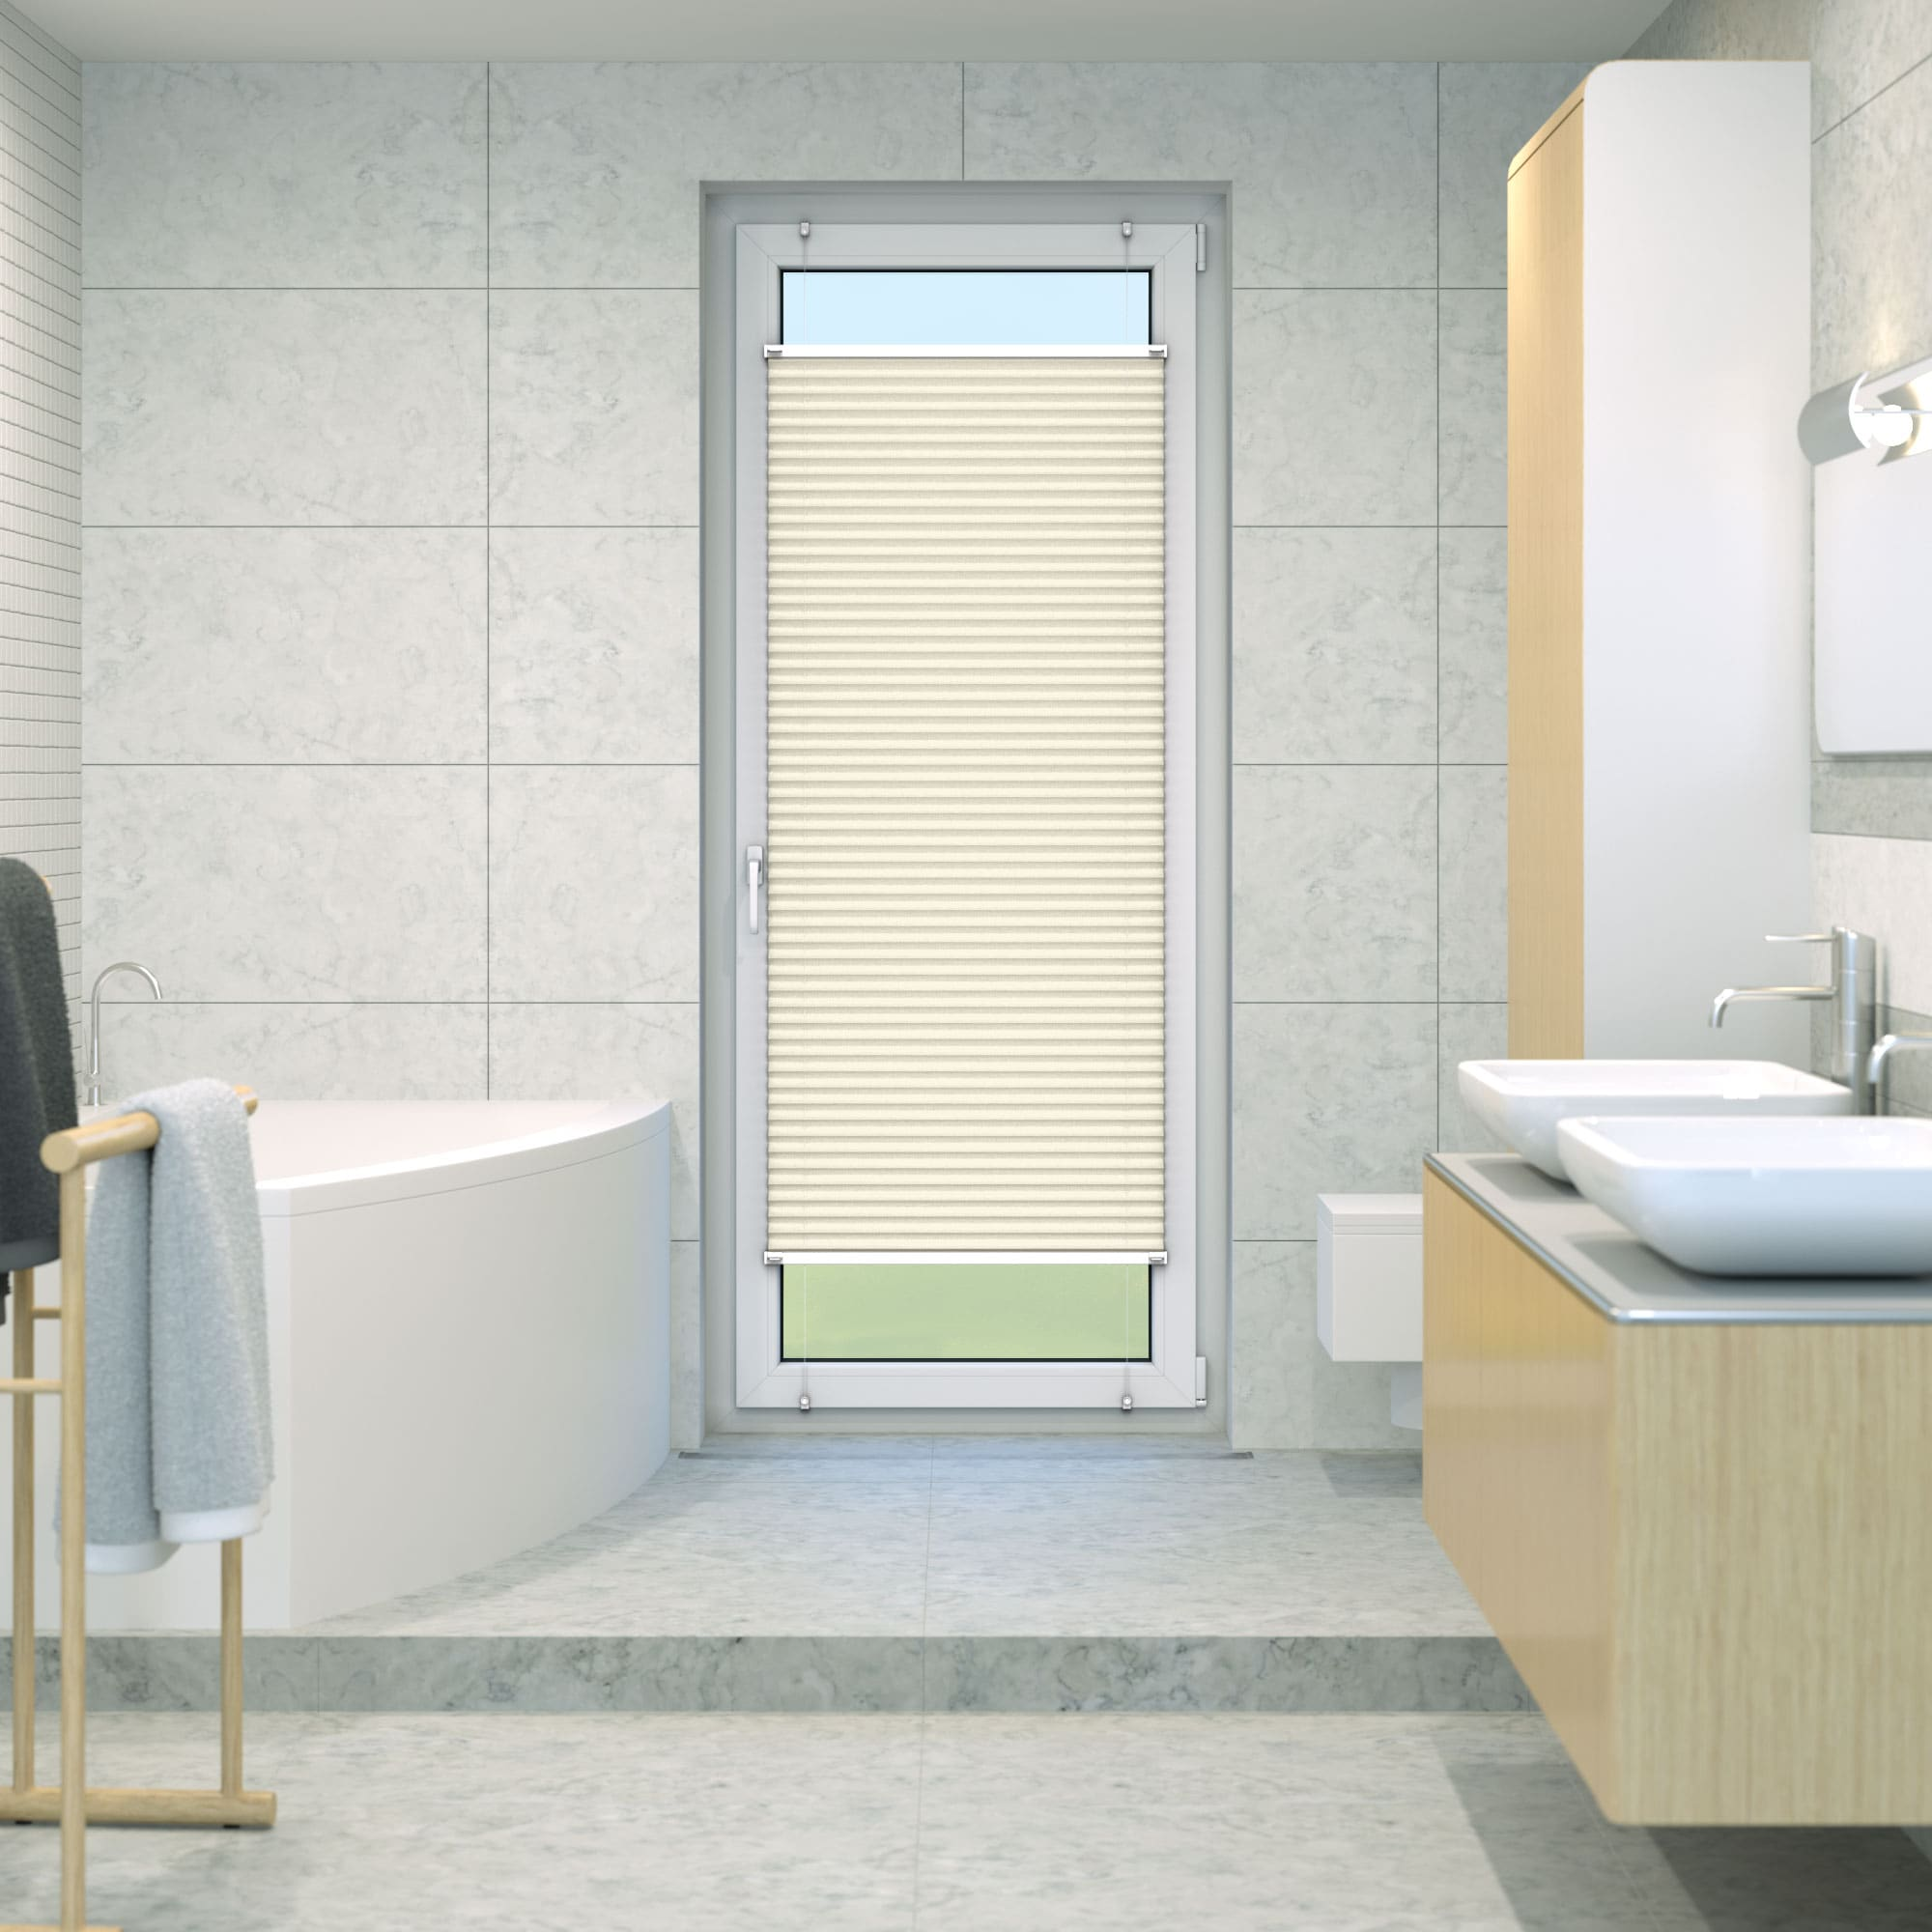 Klemmfix-Plissee-Faltrollo-ohne-Bohren-Fenster-Tuer-Plisseerollo-Plisee-Easyfix Indexbild 28